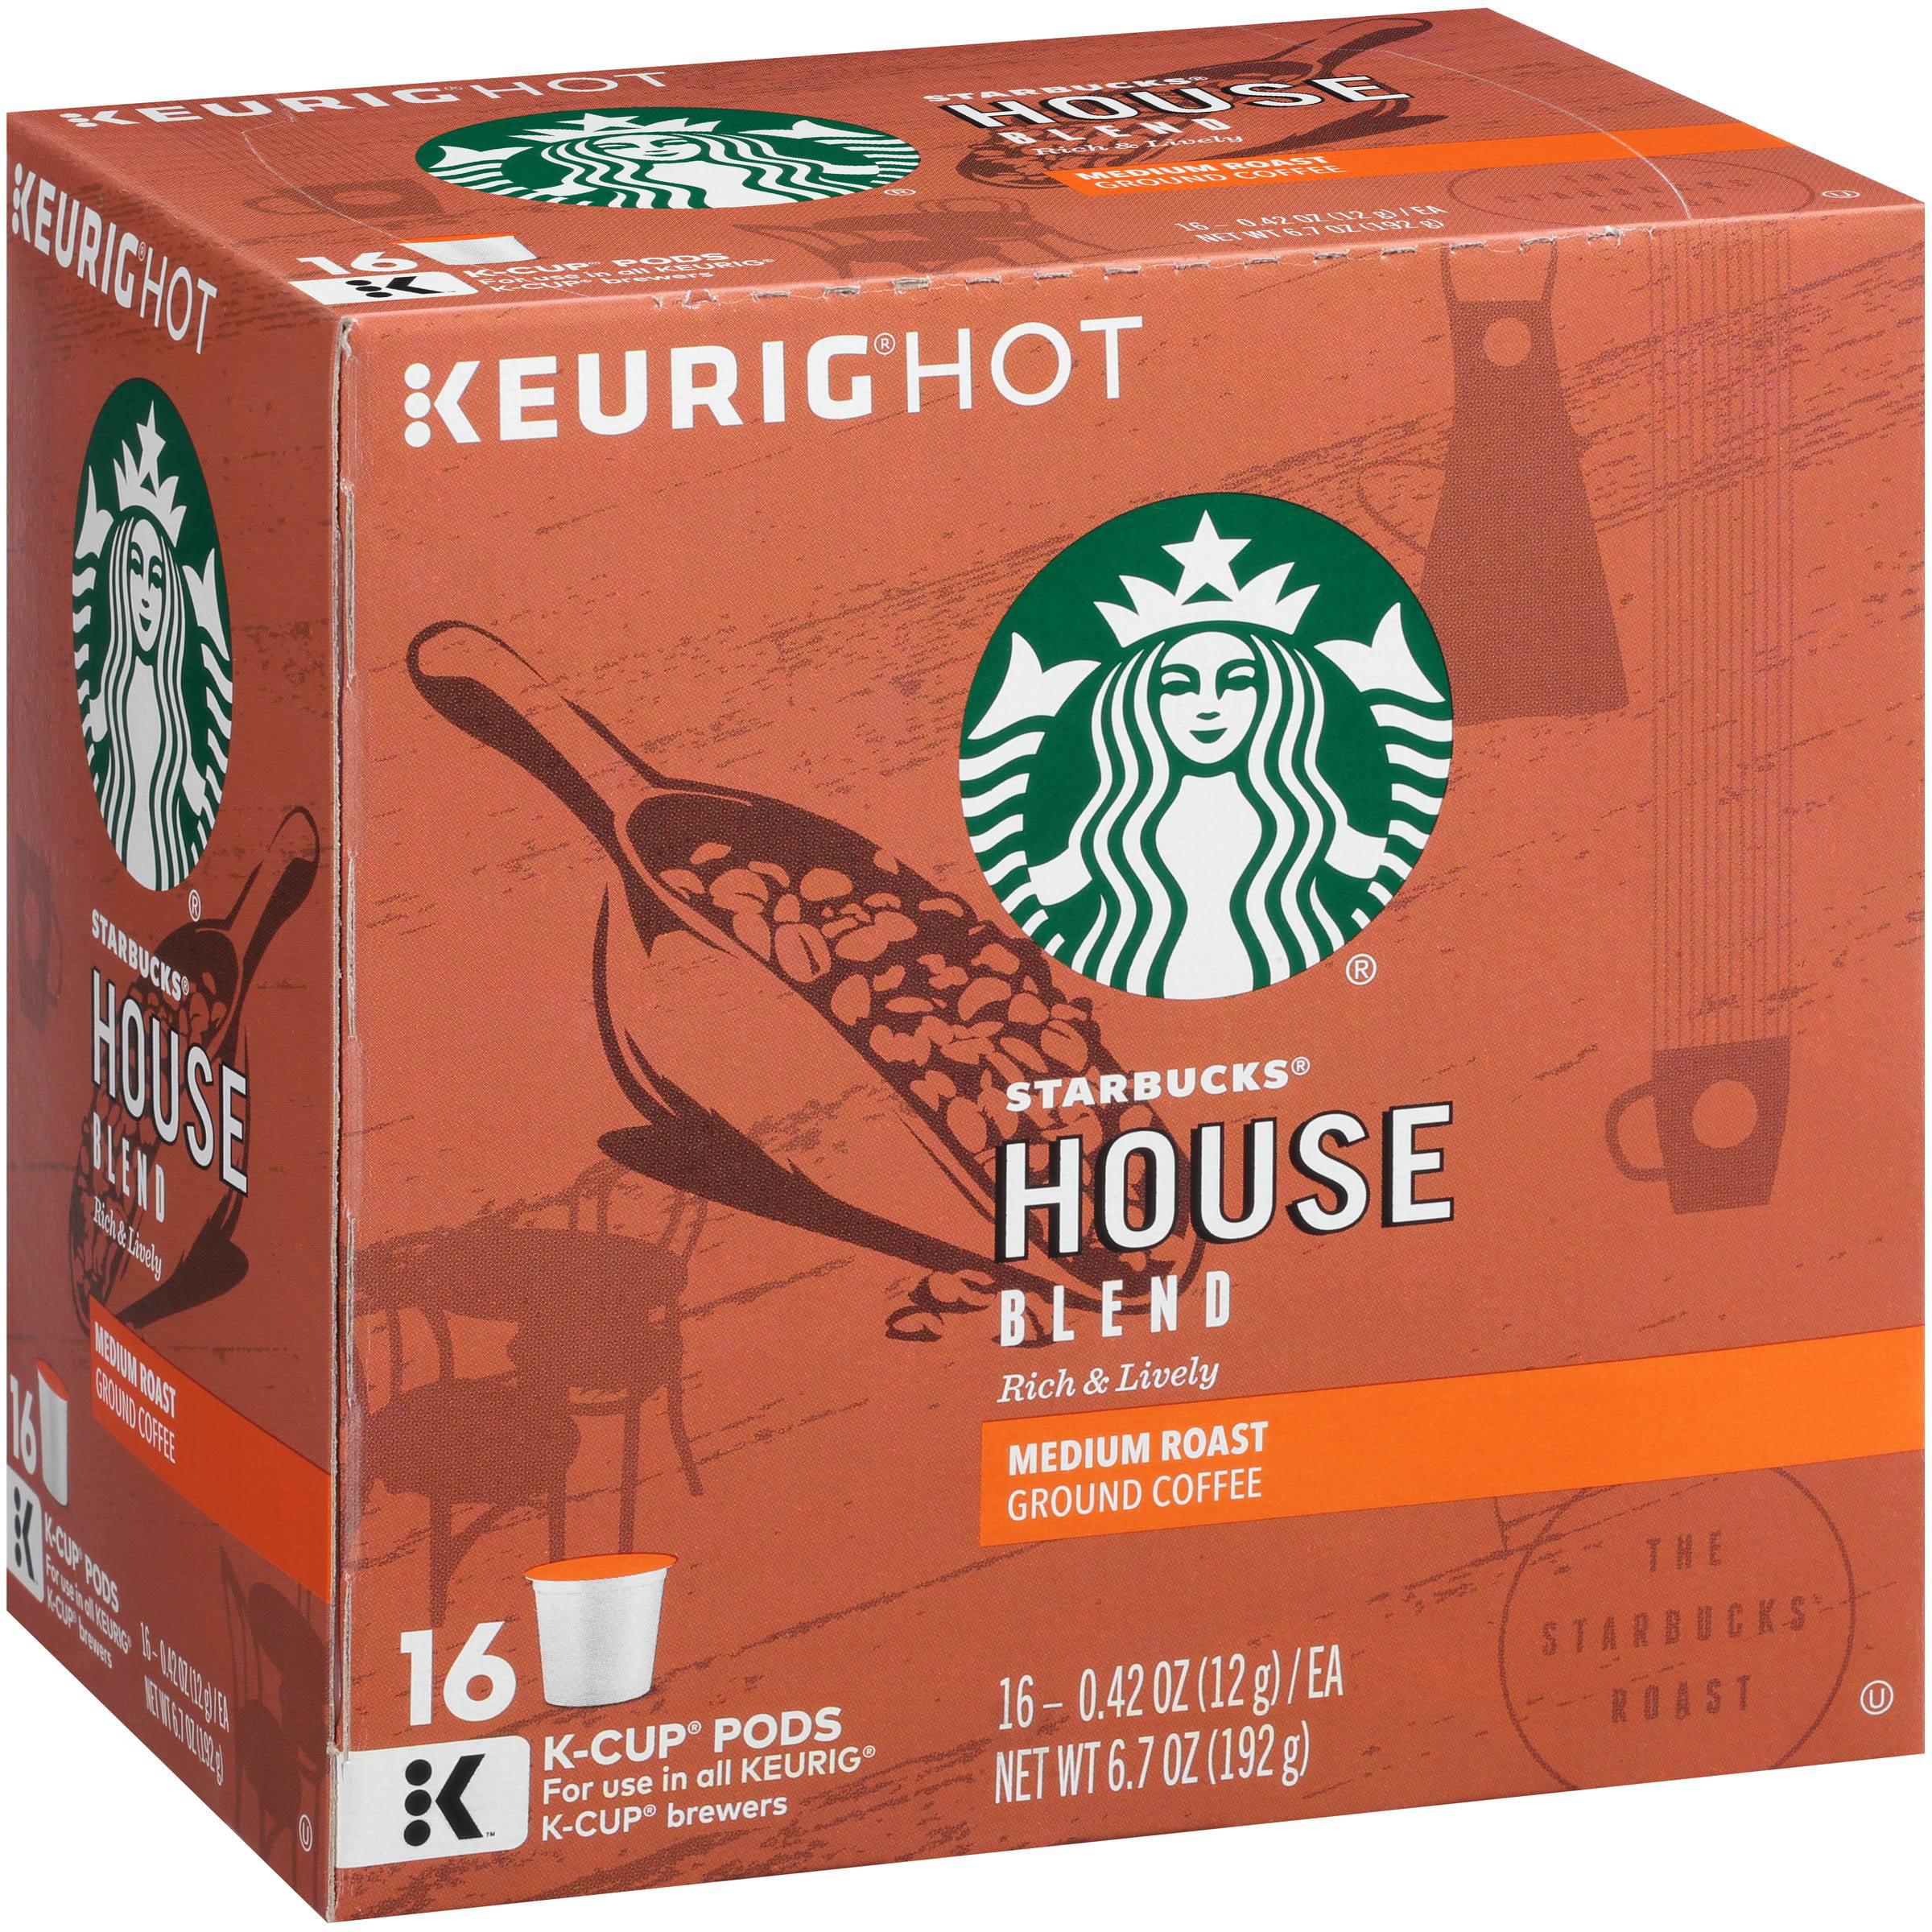 Starbucks® House Blend Medium Ground Coffee K-Cups 16 ct Box